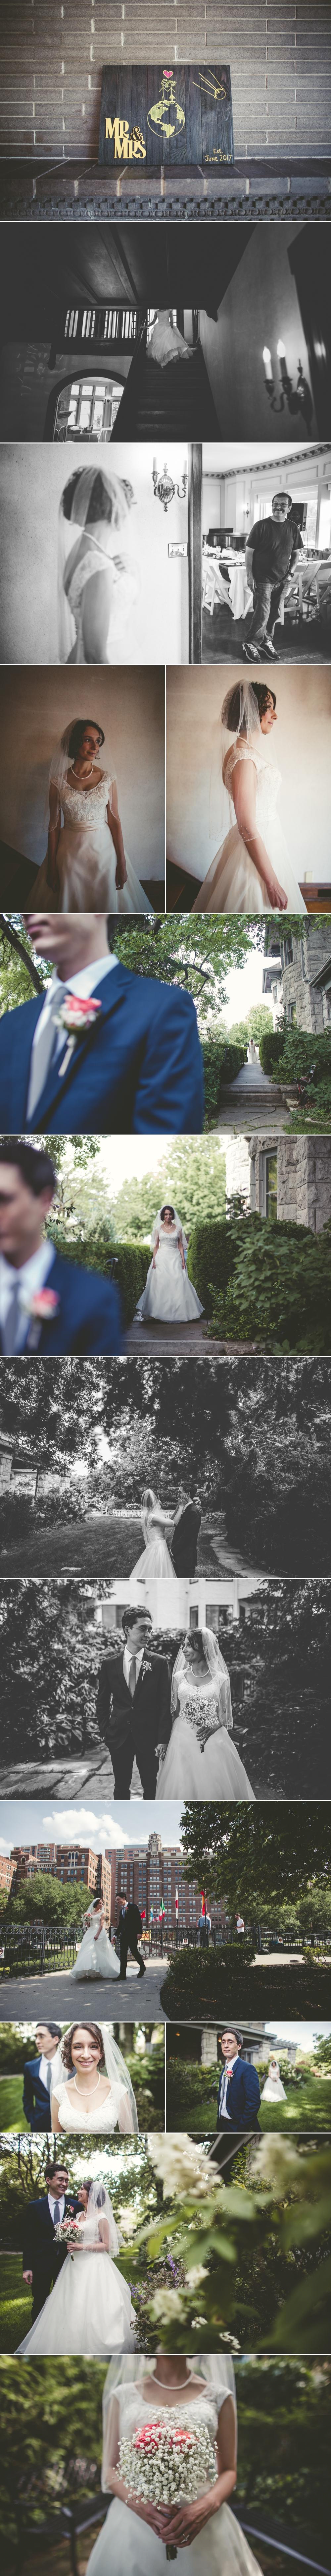 jason_domingues_photography_best_kansas_city_photographer_kc_weddings_simpson_house_0001